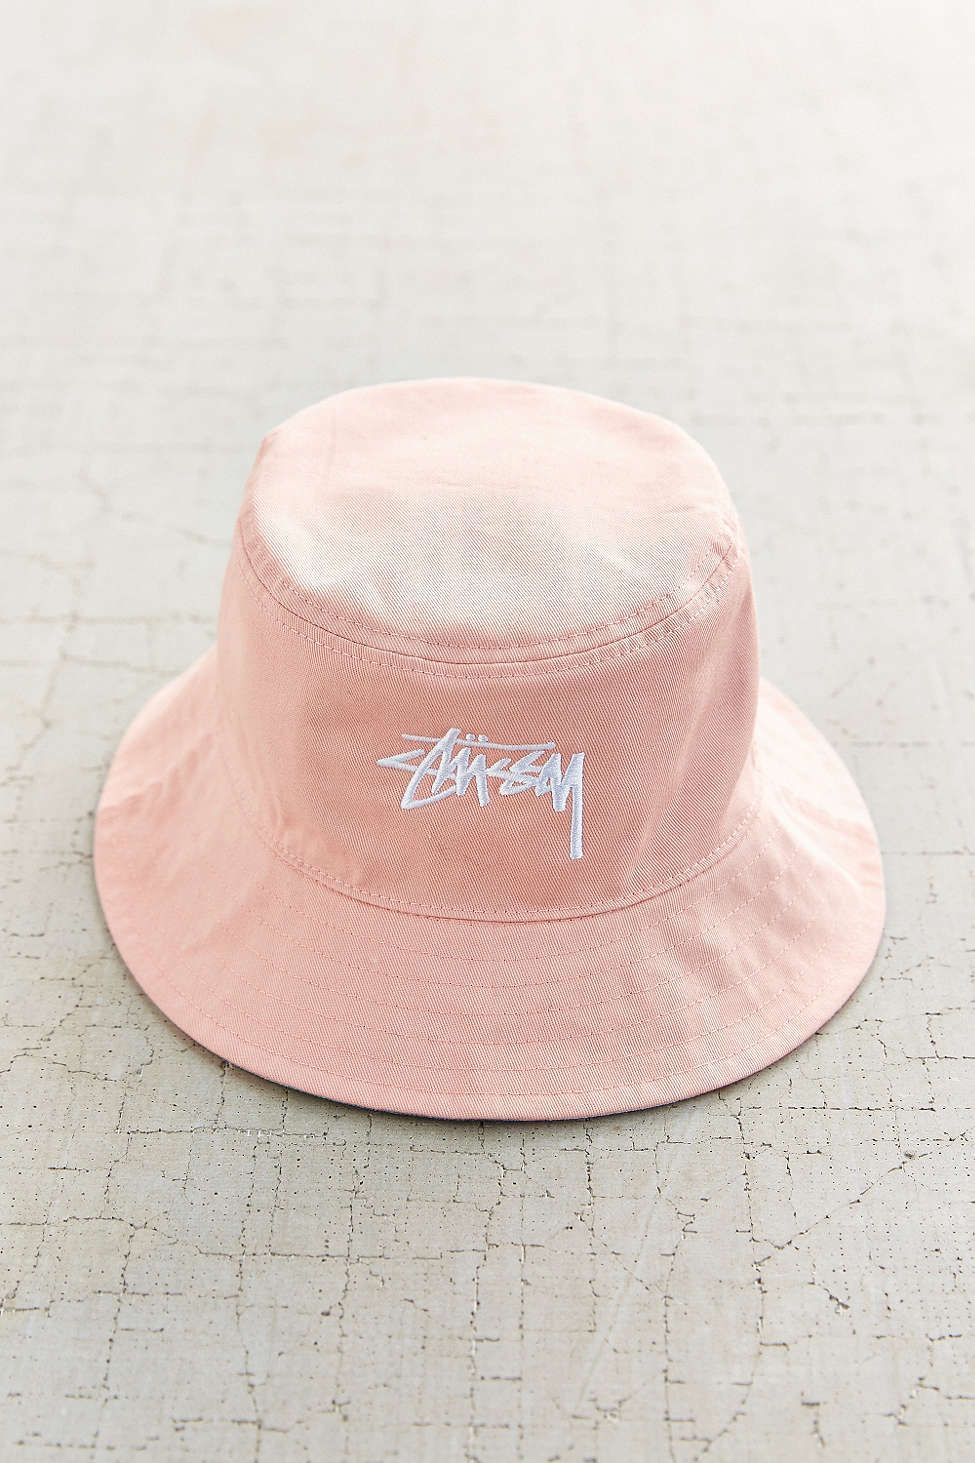 7f3c7d0eda1 Stussy For UO Digital Print Reversible Bucket Hat